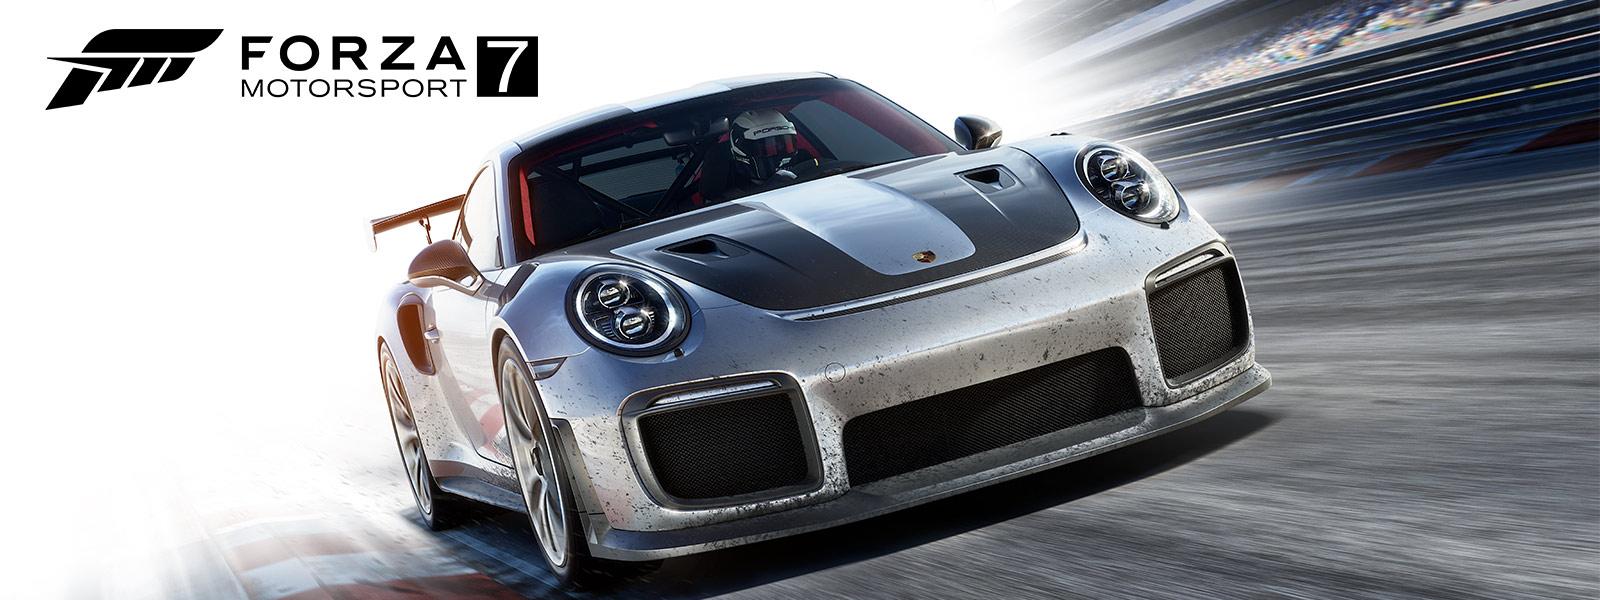 Forza Motorsport 7, spelskärm